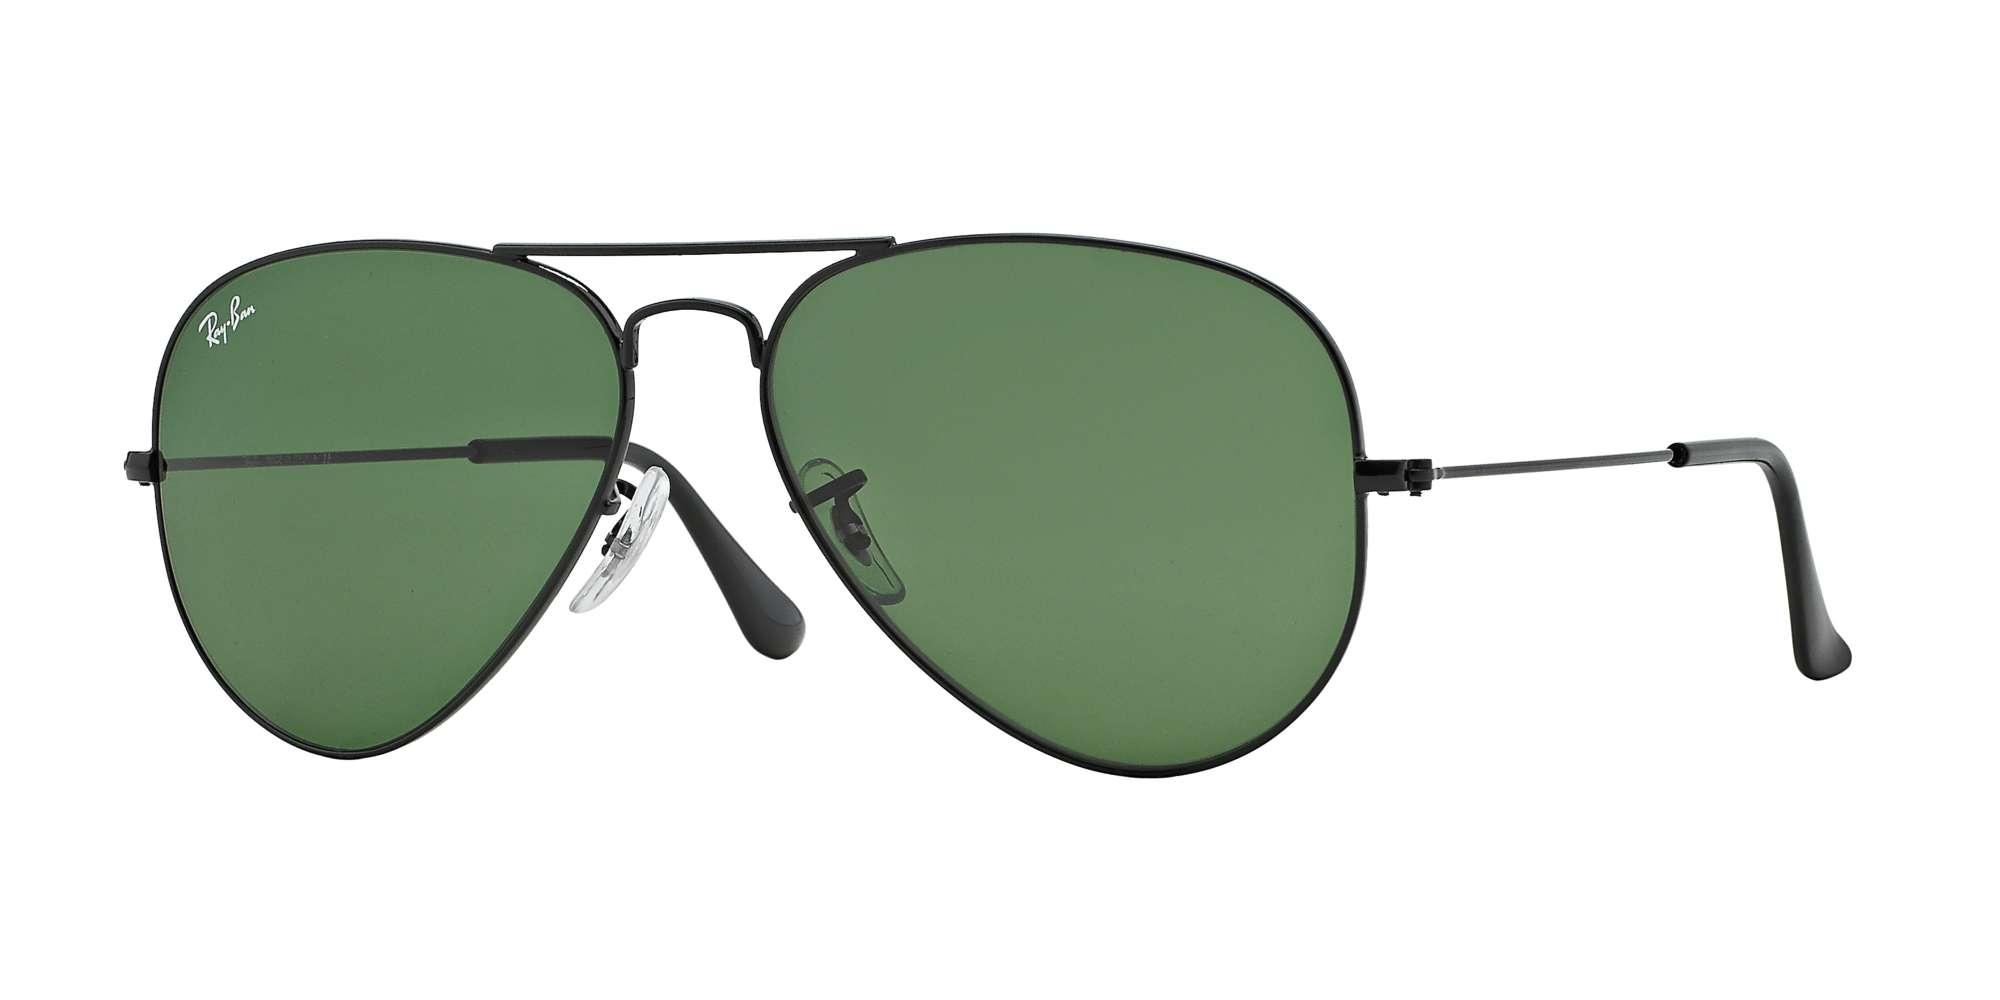 BLACK / GREY GREEN lenses